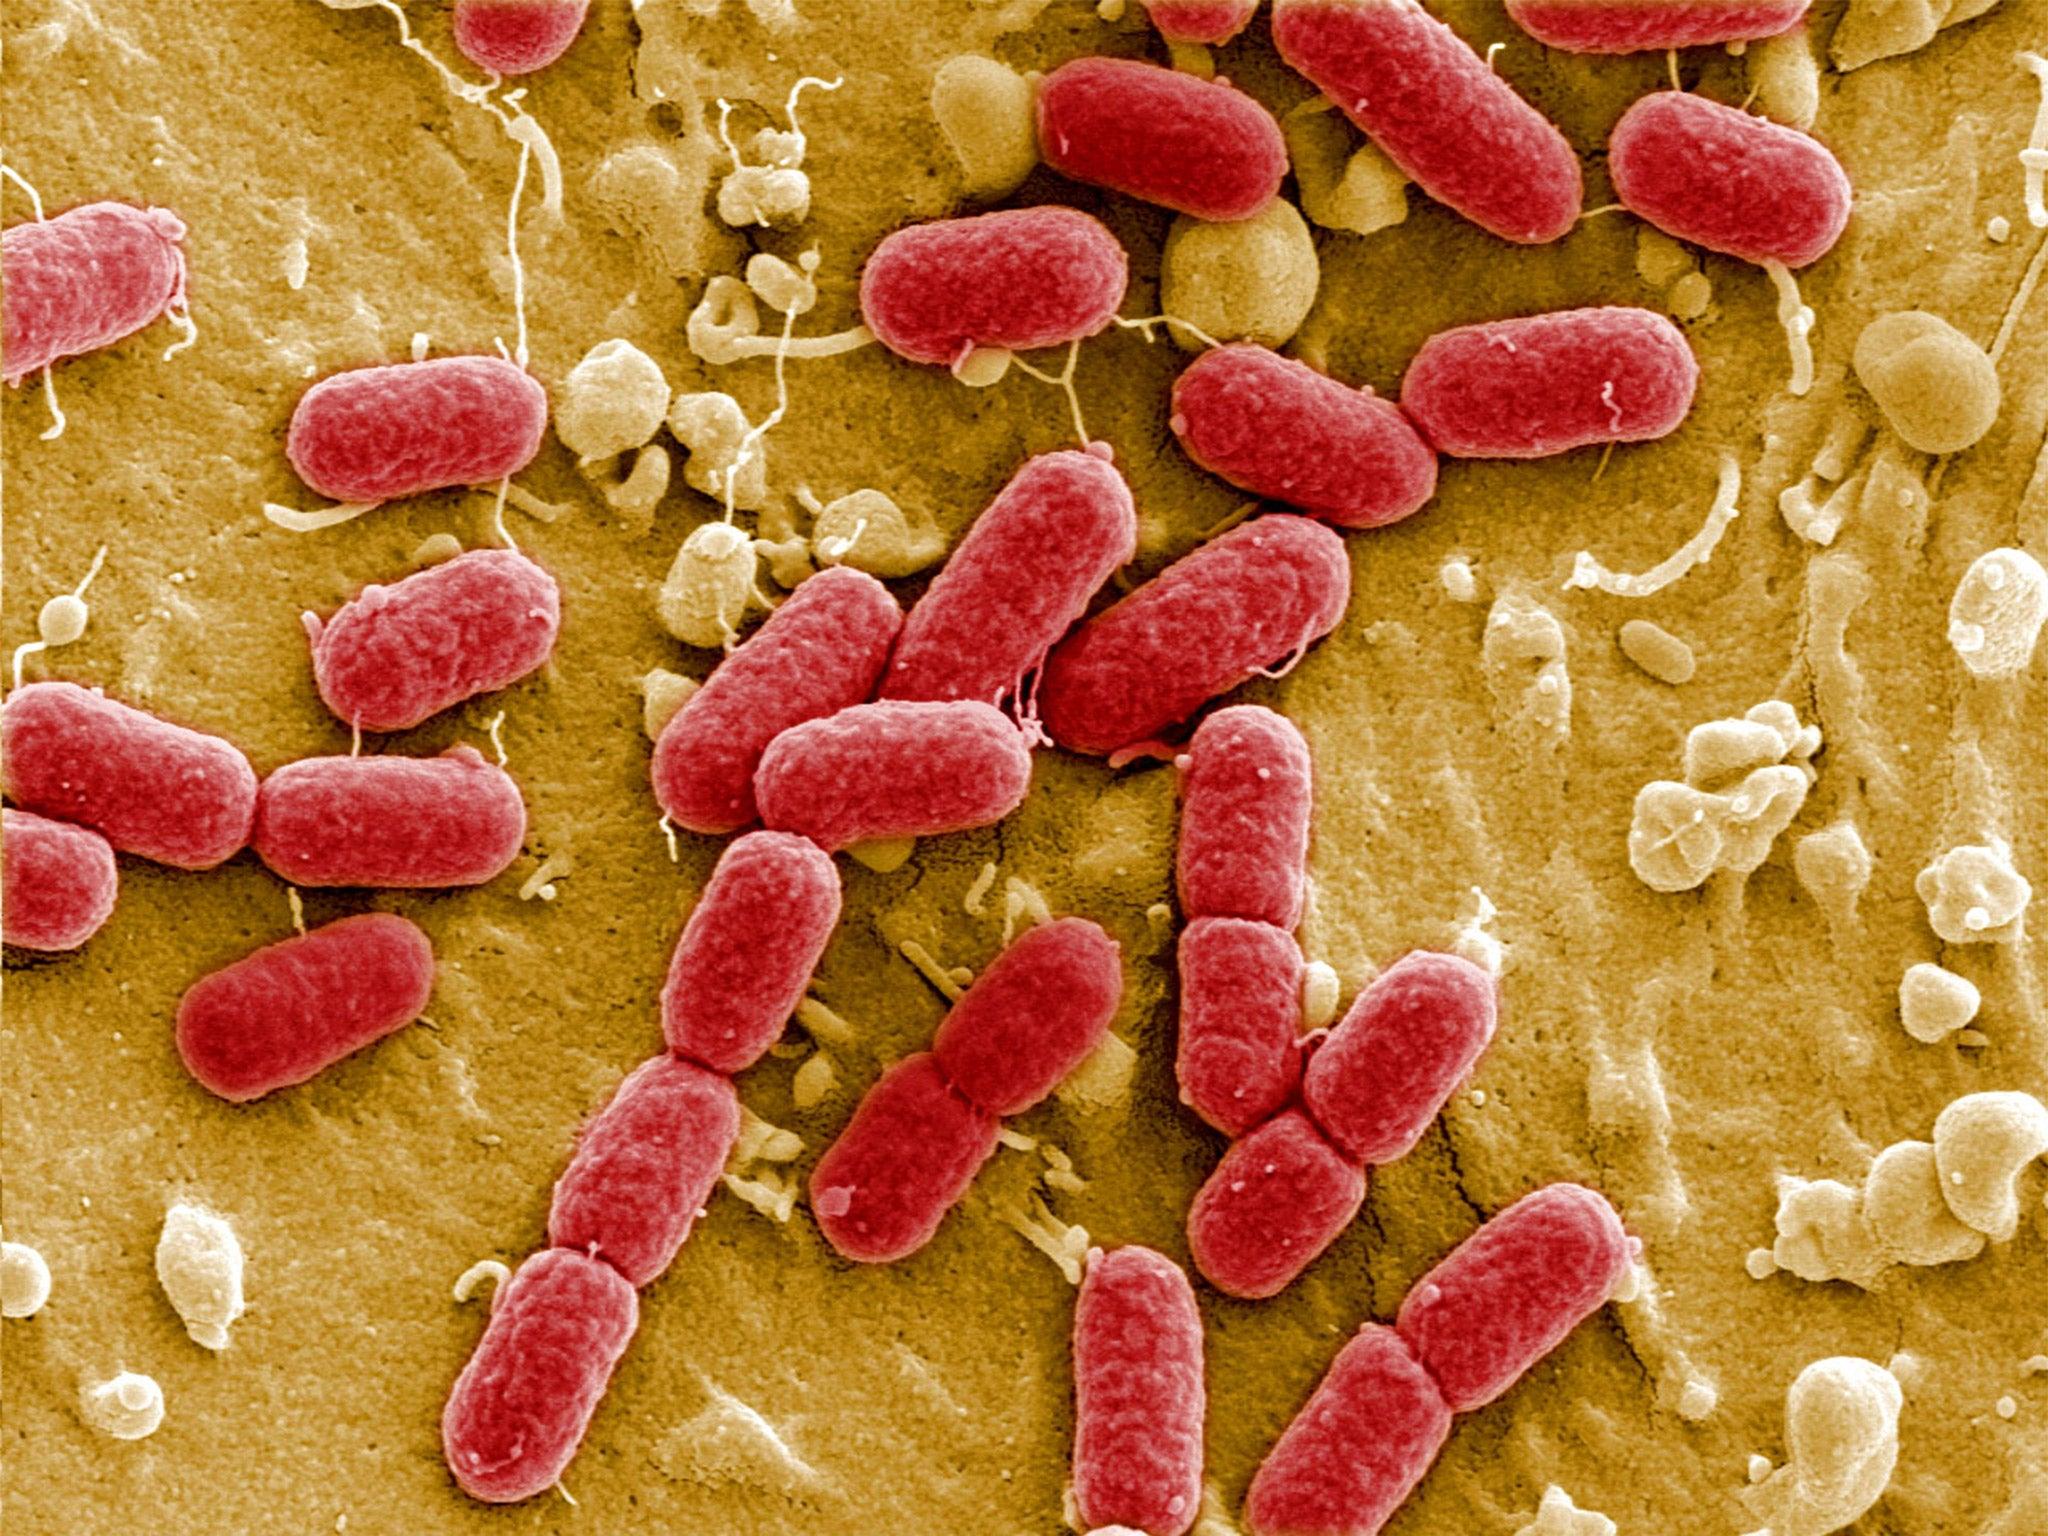 Superbug resistant to 'antibiotic of last resort' found in US